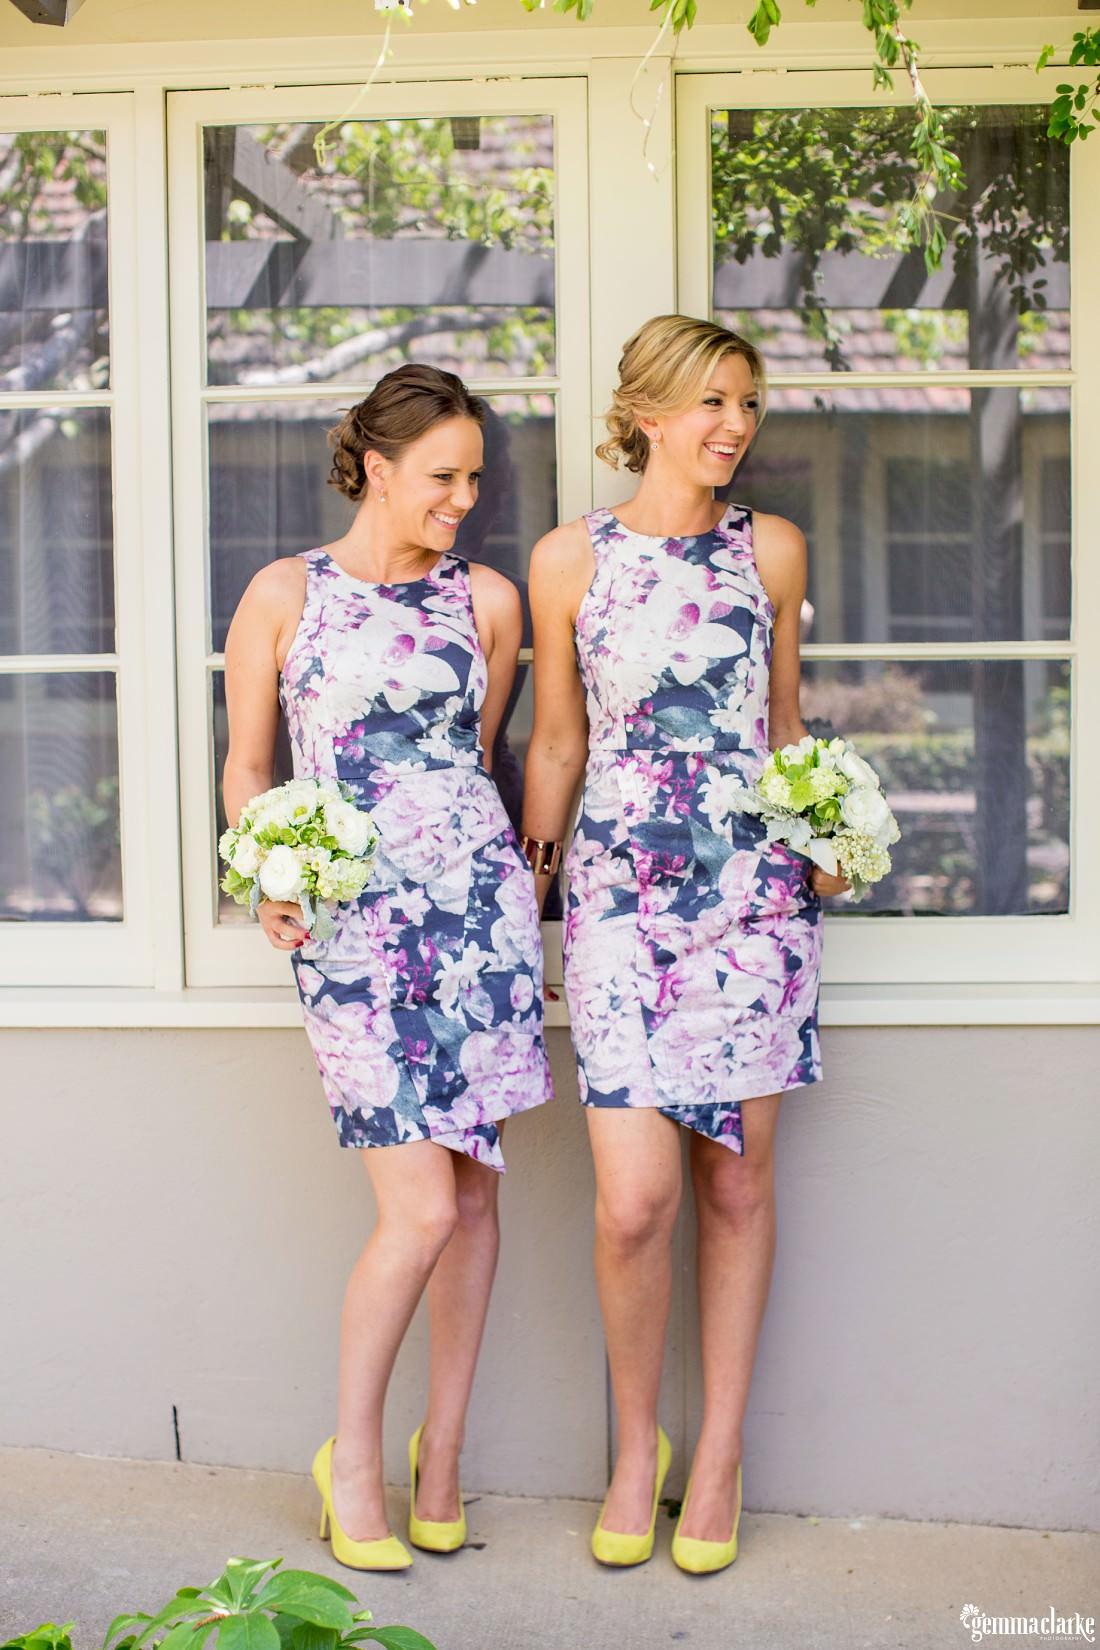 gemma-clarke-photography_southern-highlands-wedding_biota-dining-wedding_ashley-and-hally_0012